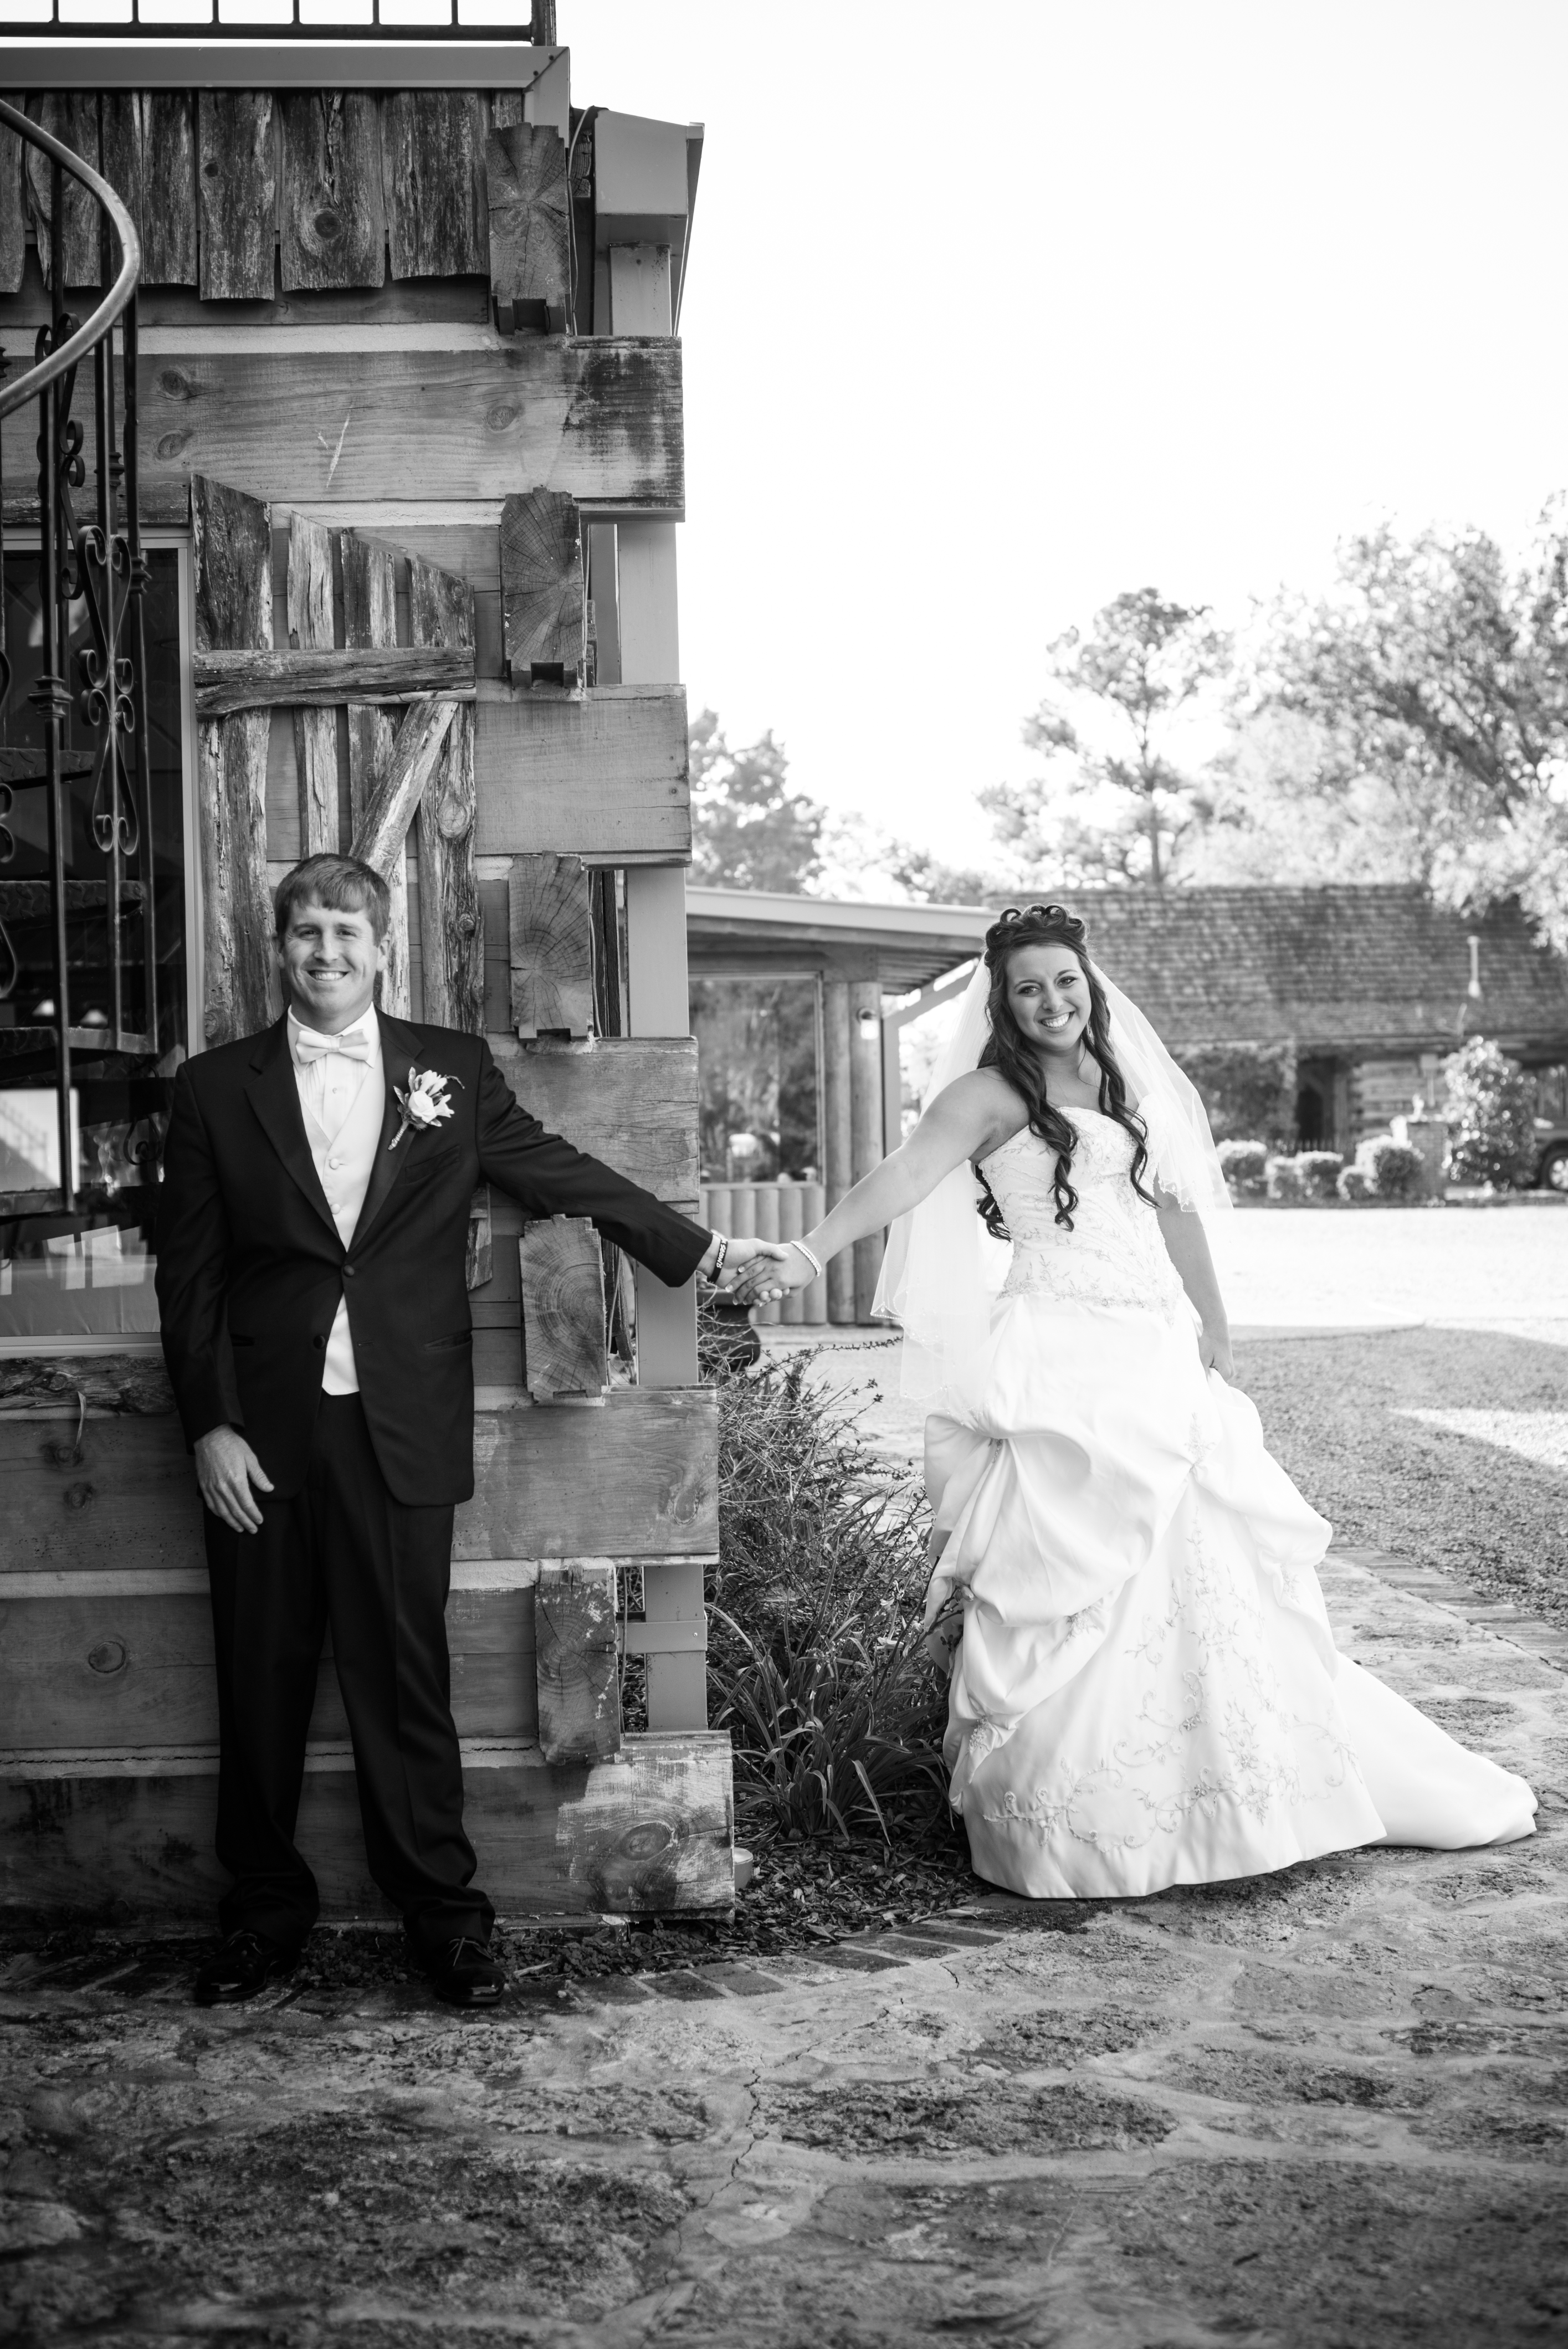 Matt-Blakely-wedding-nashville-tn-legacy-farms-638